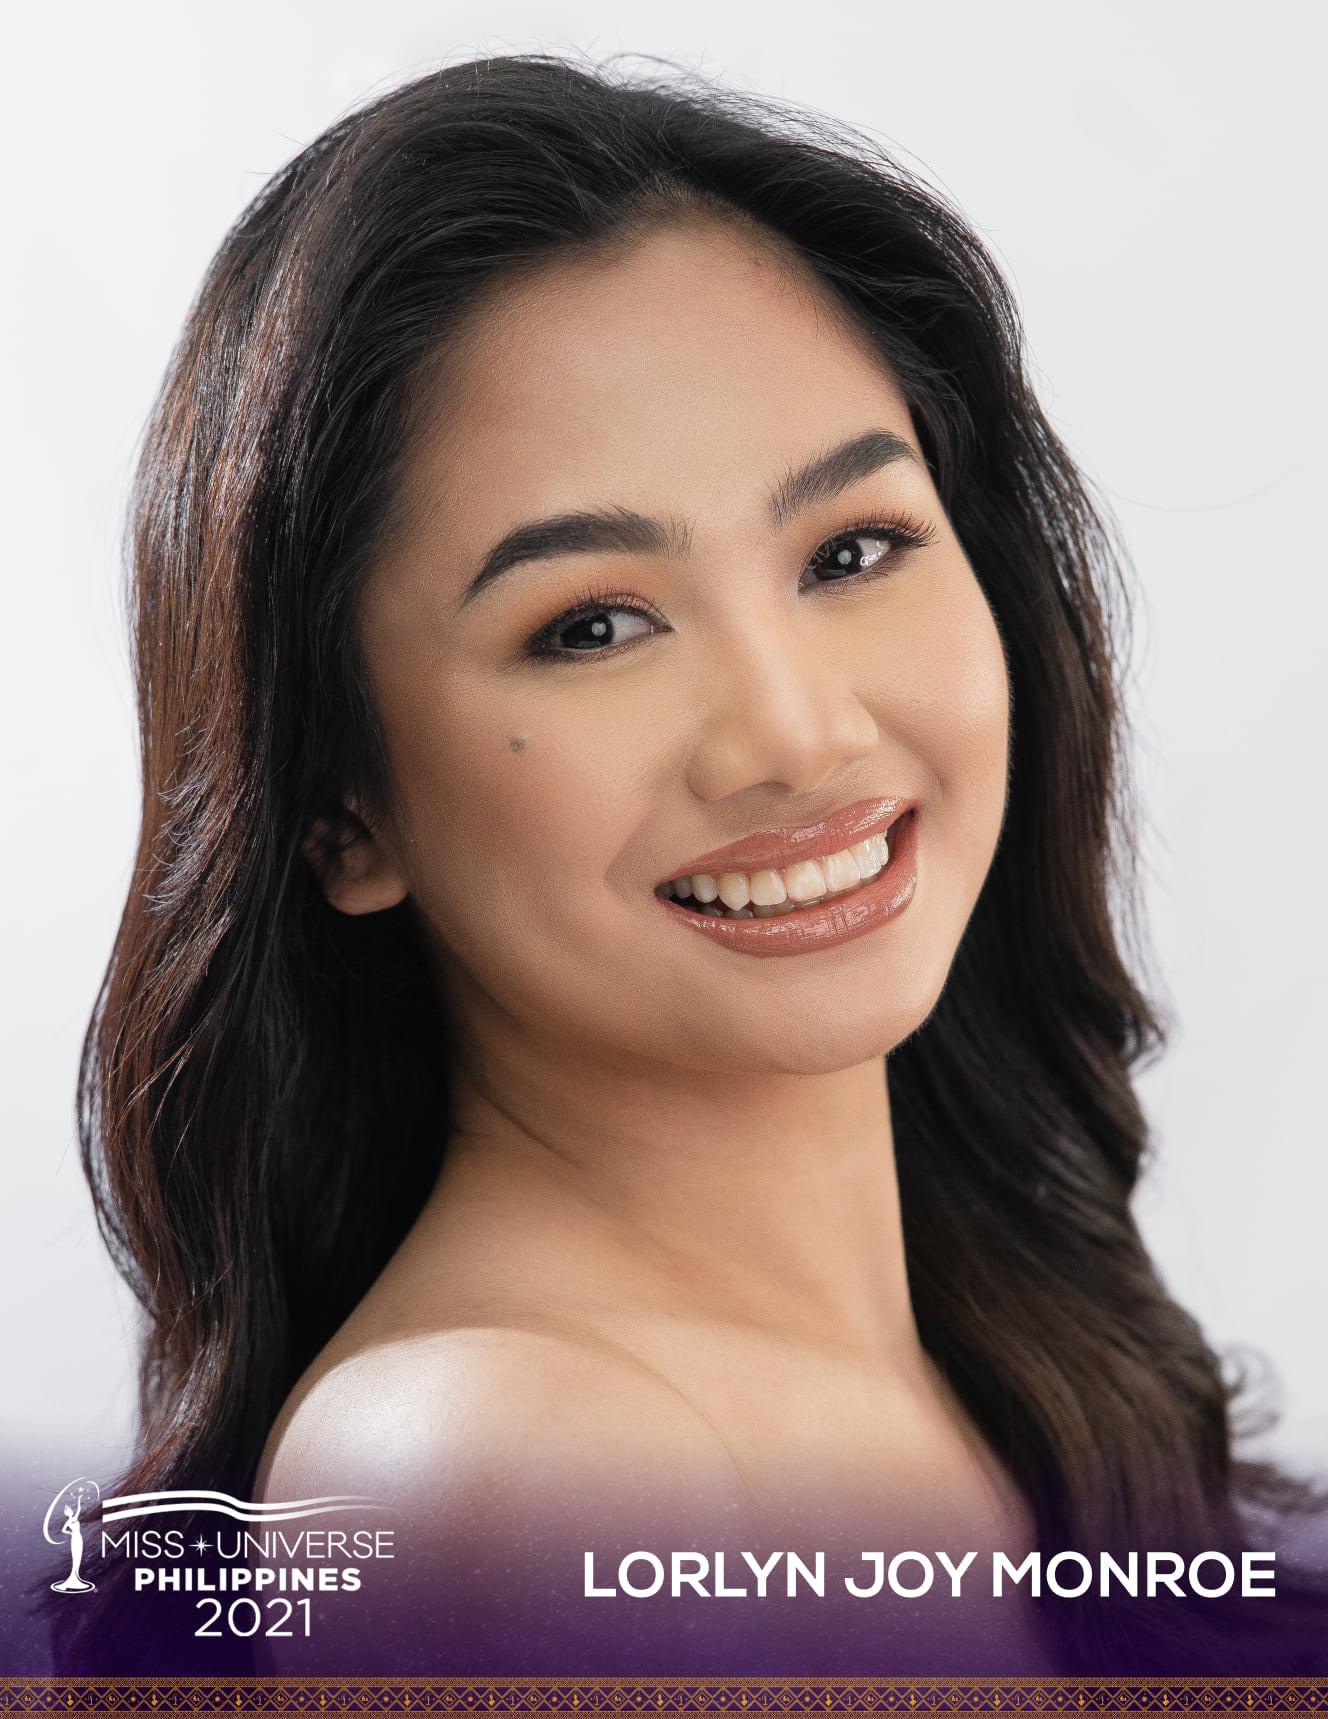 pre-candidatas a miss universe philippines 2021. - Página 3 AlCm6x